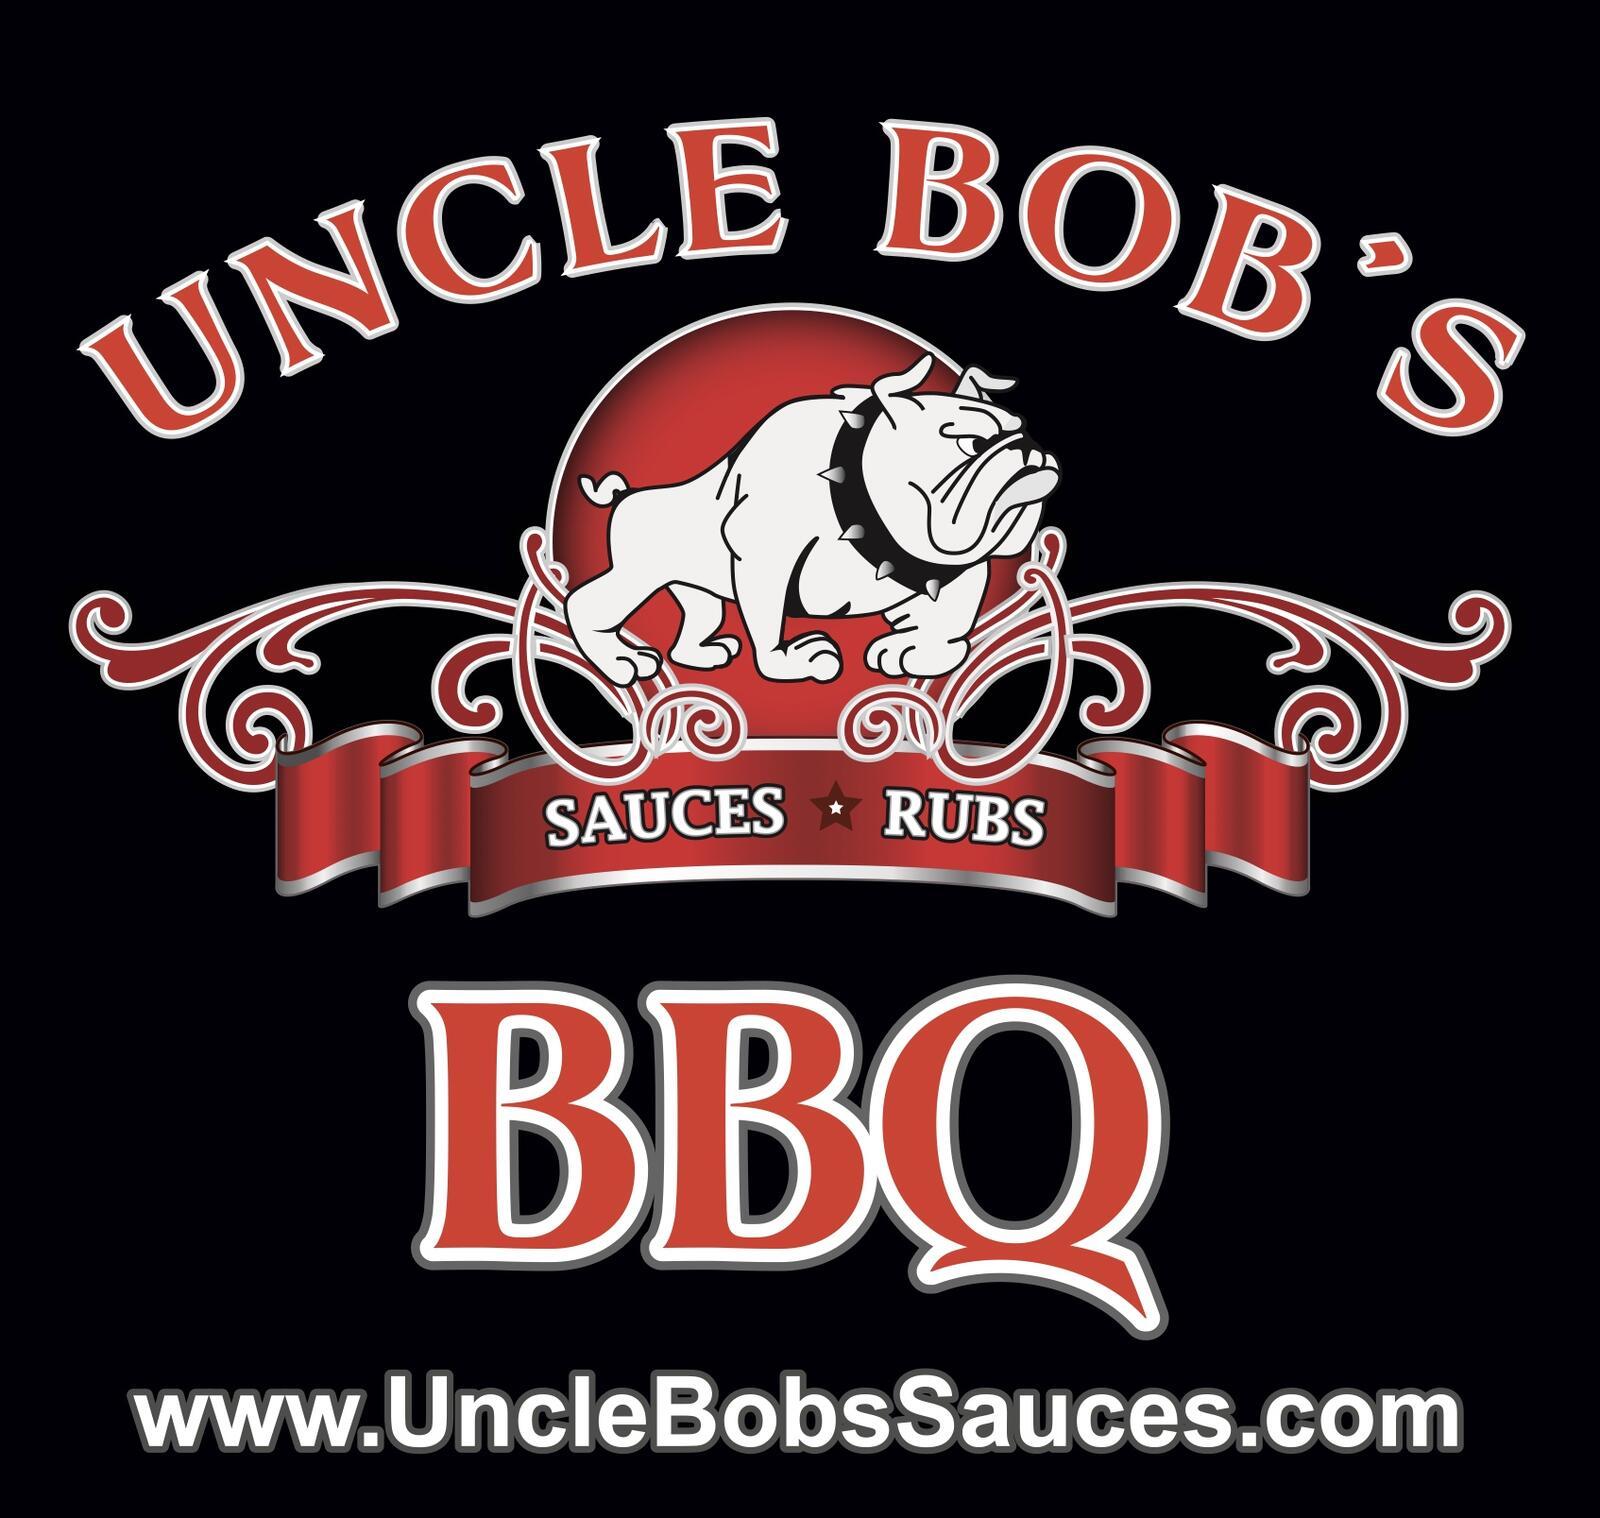 Uncle Bob's BBQ